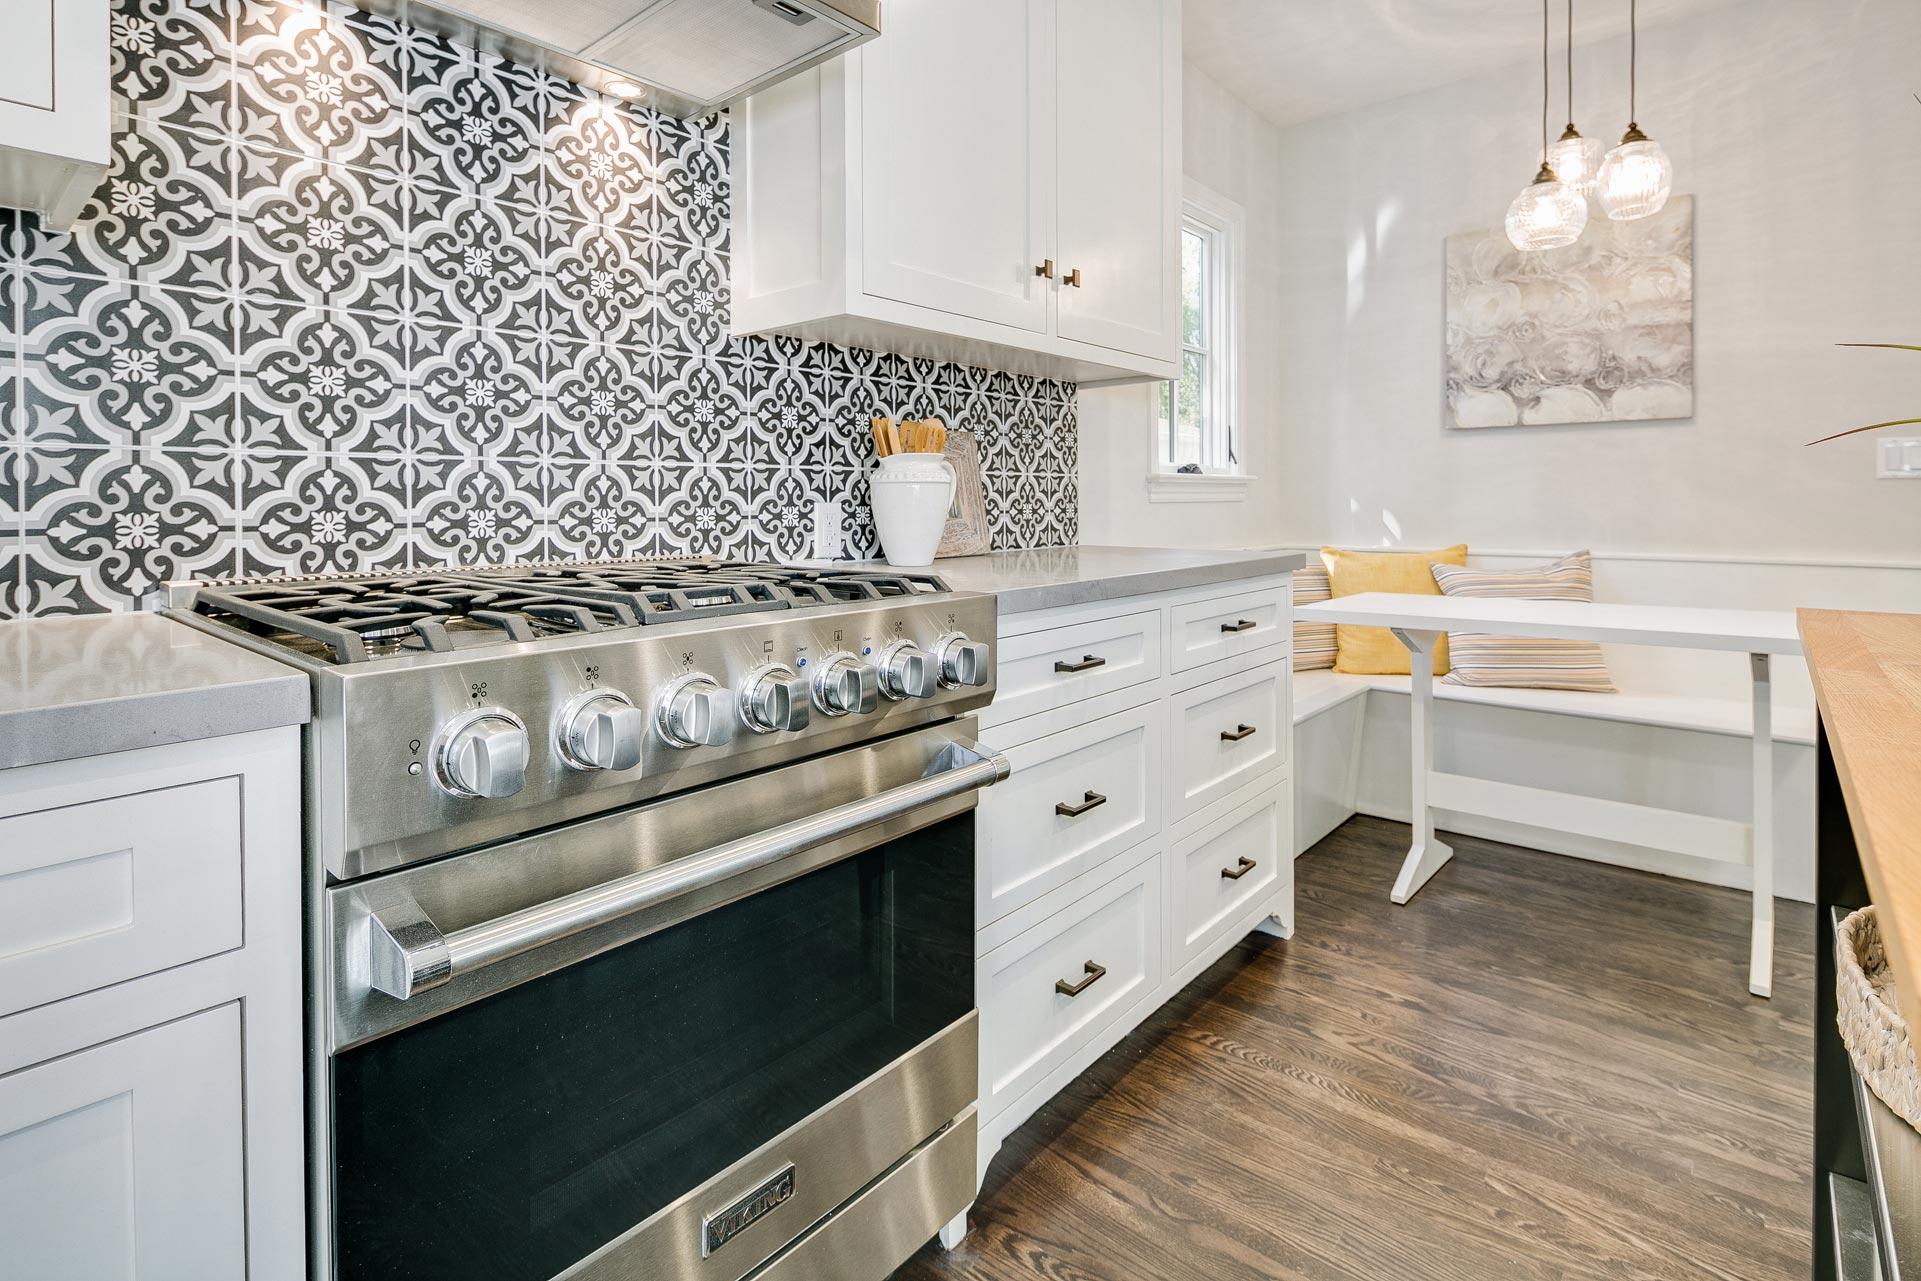 English-Cottage-Kitchen-Backsplash-Range-Premier-General-Contractors.jpg